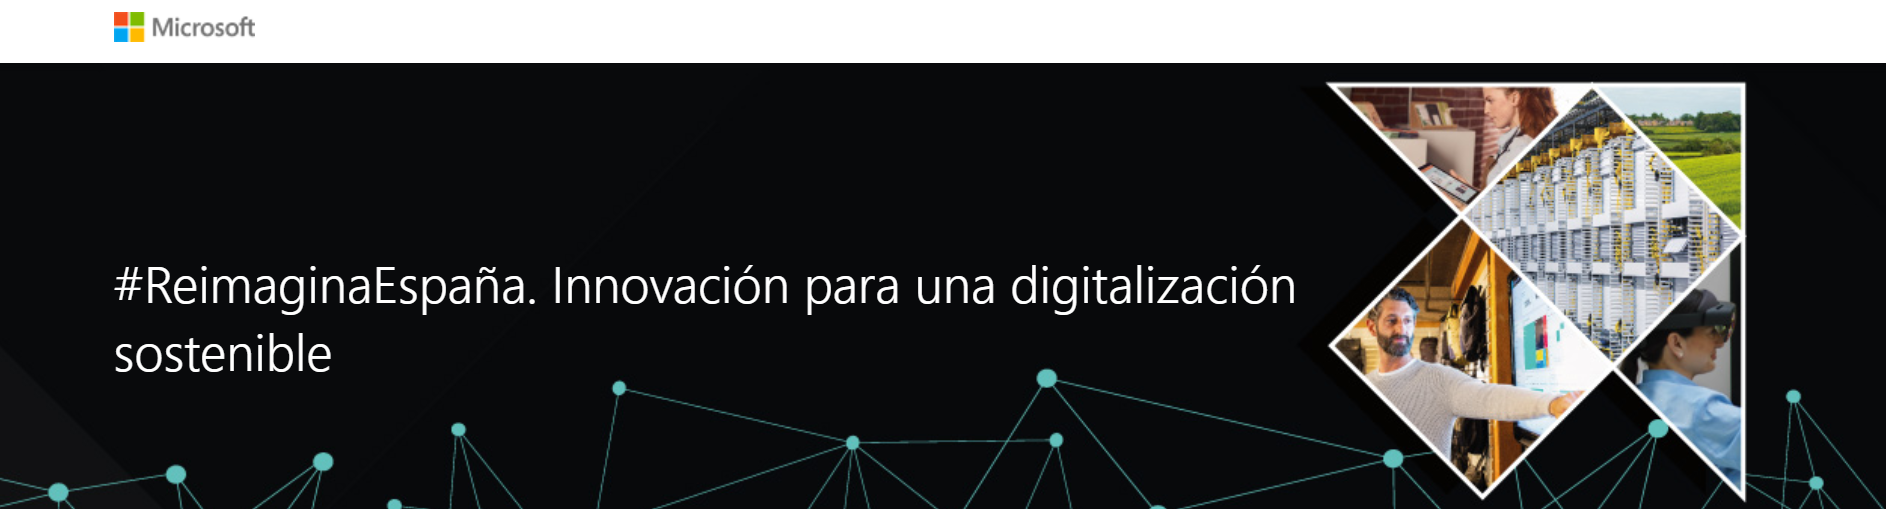 Reimagina Microsoft